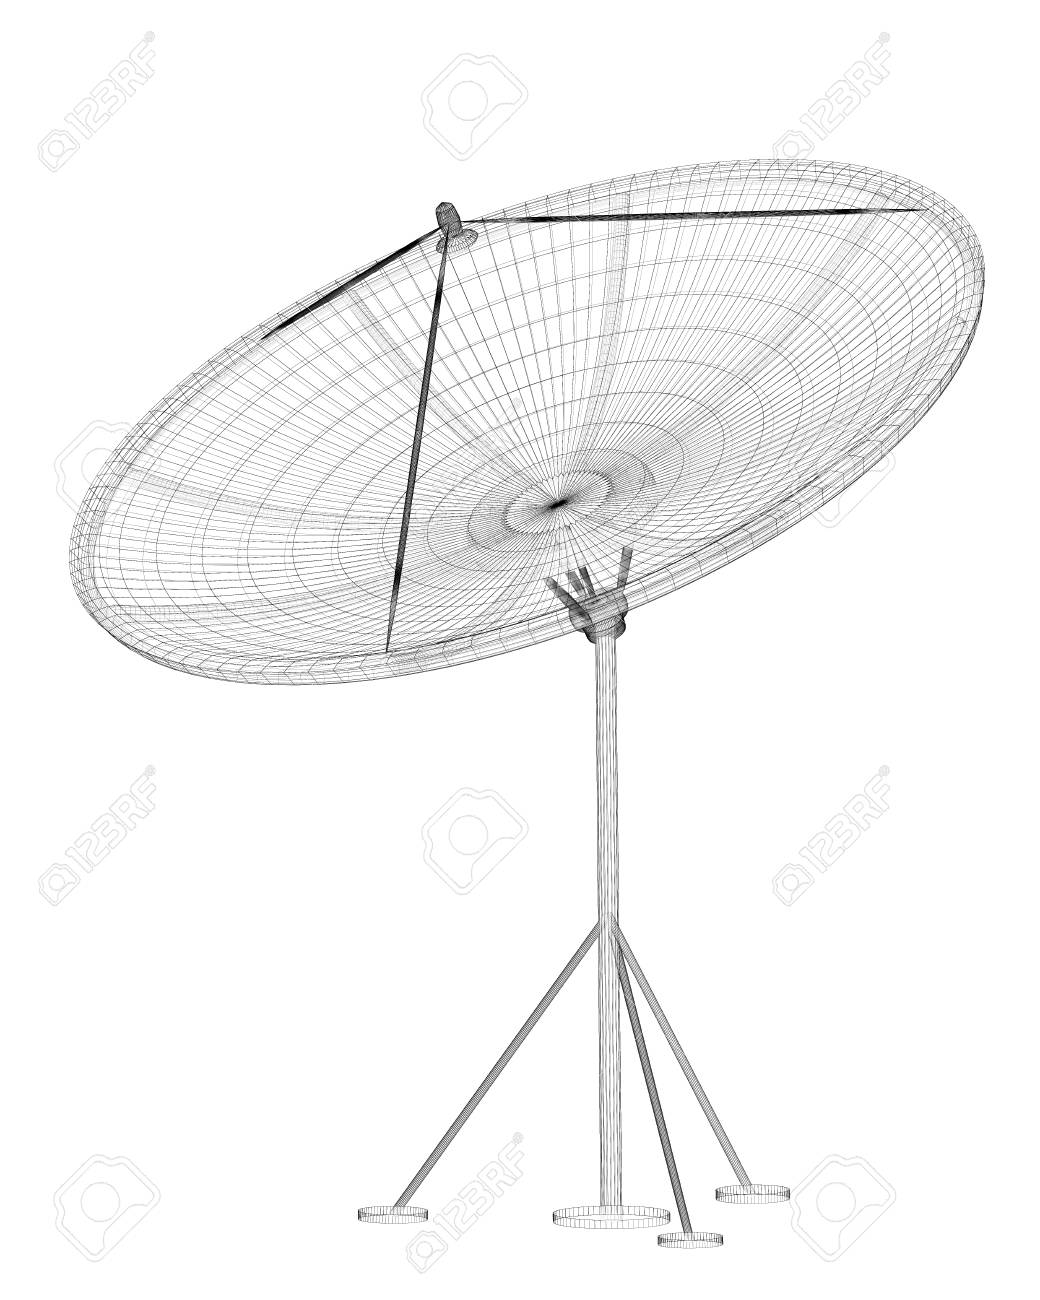 satellite tracking system satellite dish on the background stock Satellite Dish Clip Art satellite tracking system satellite dish on the background stock photo 59883150